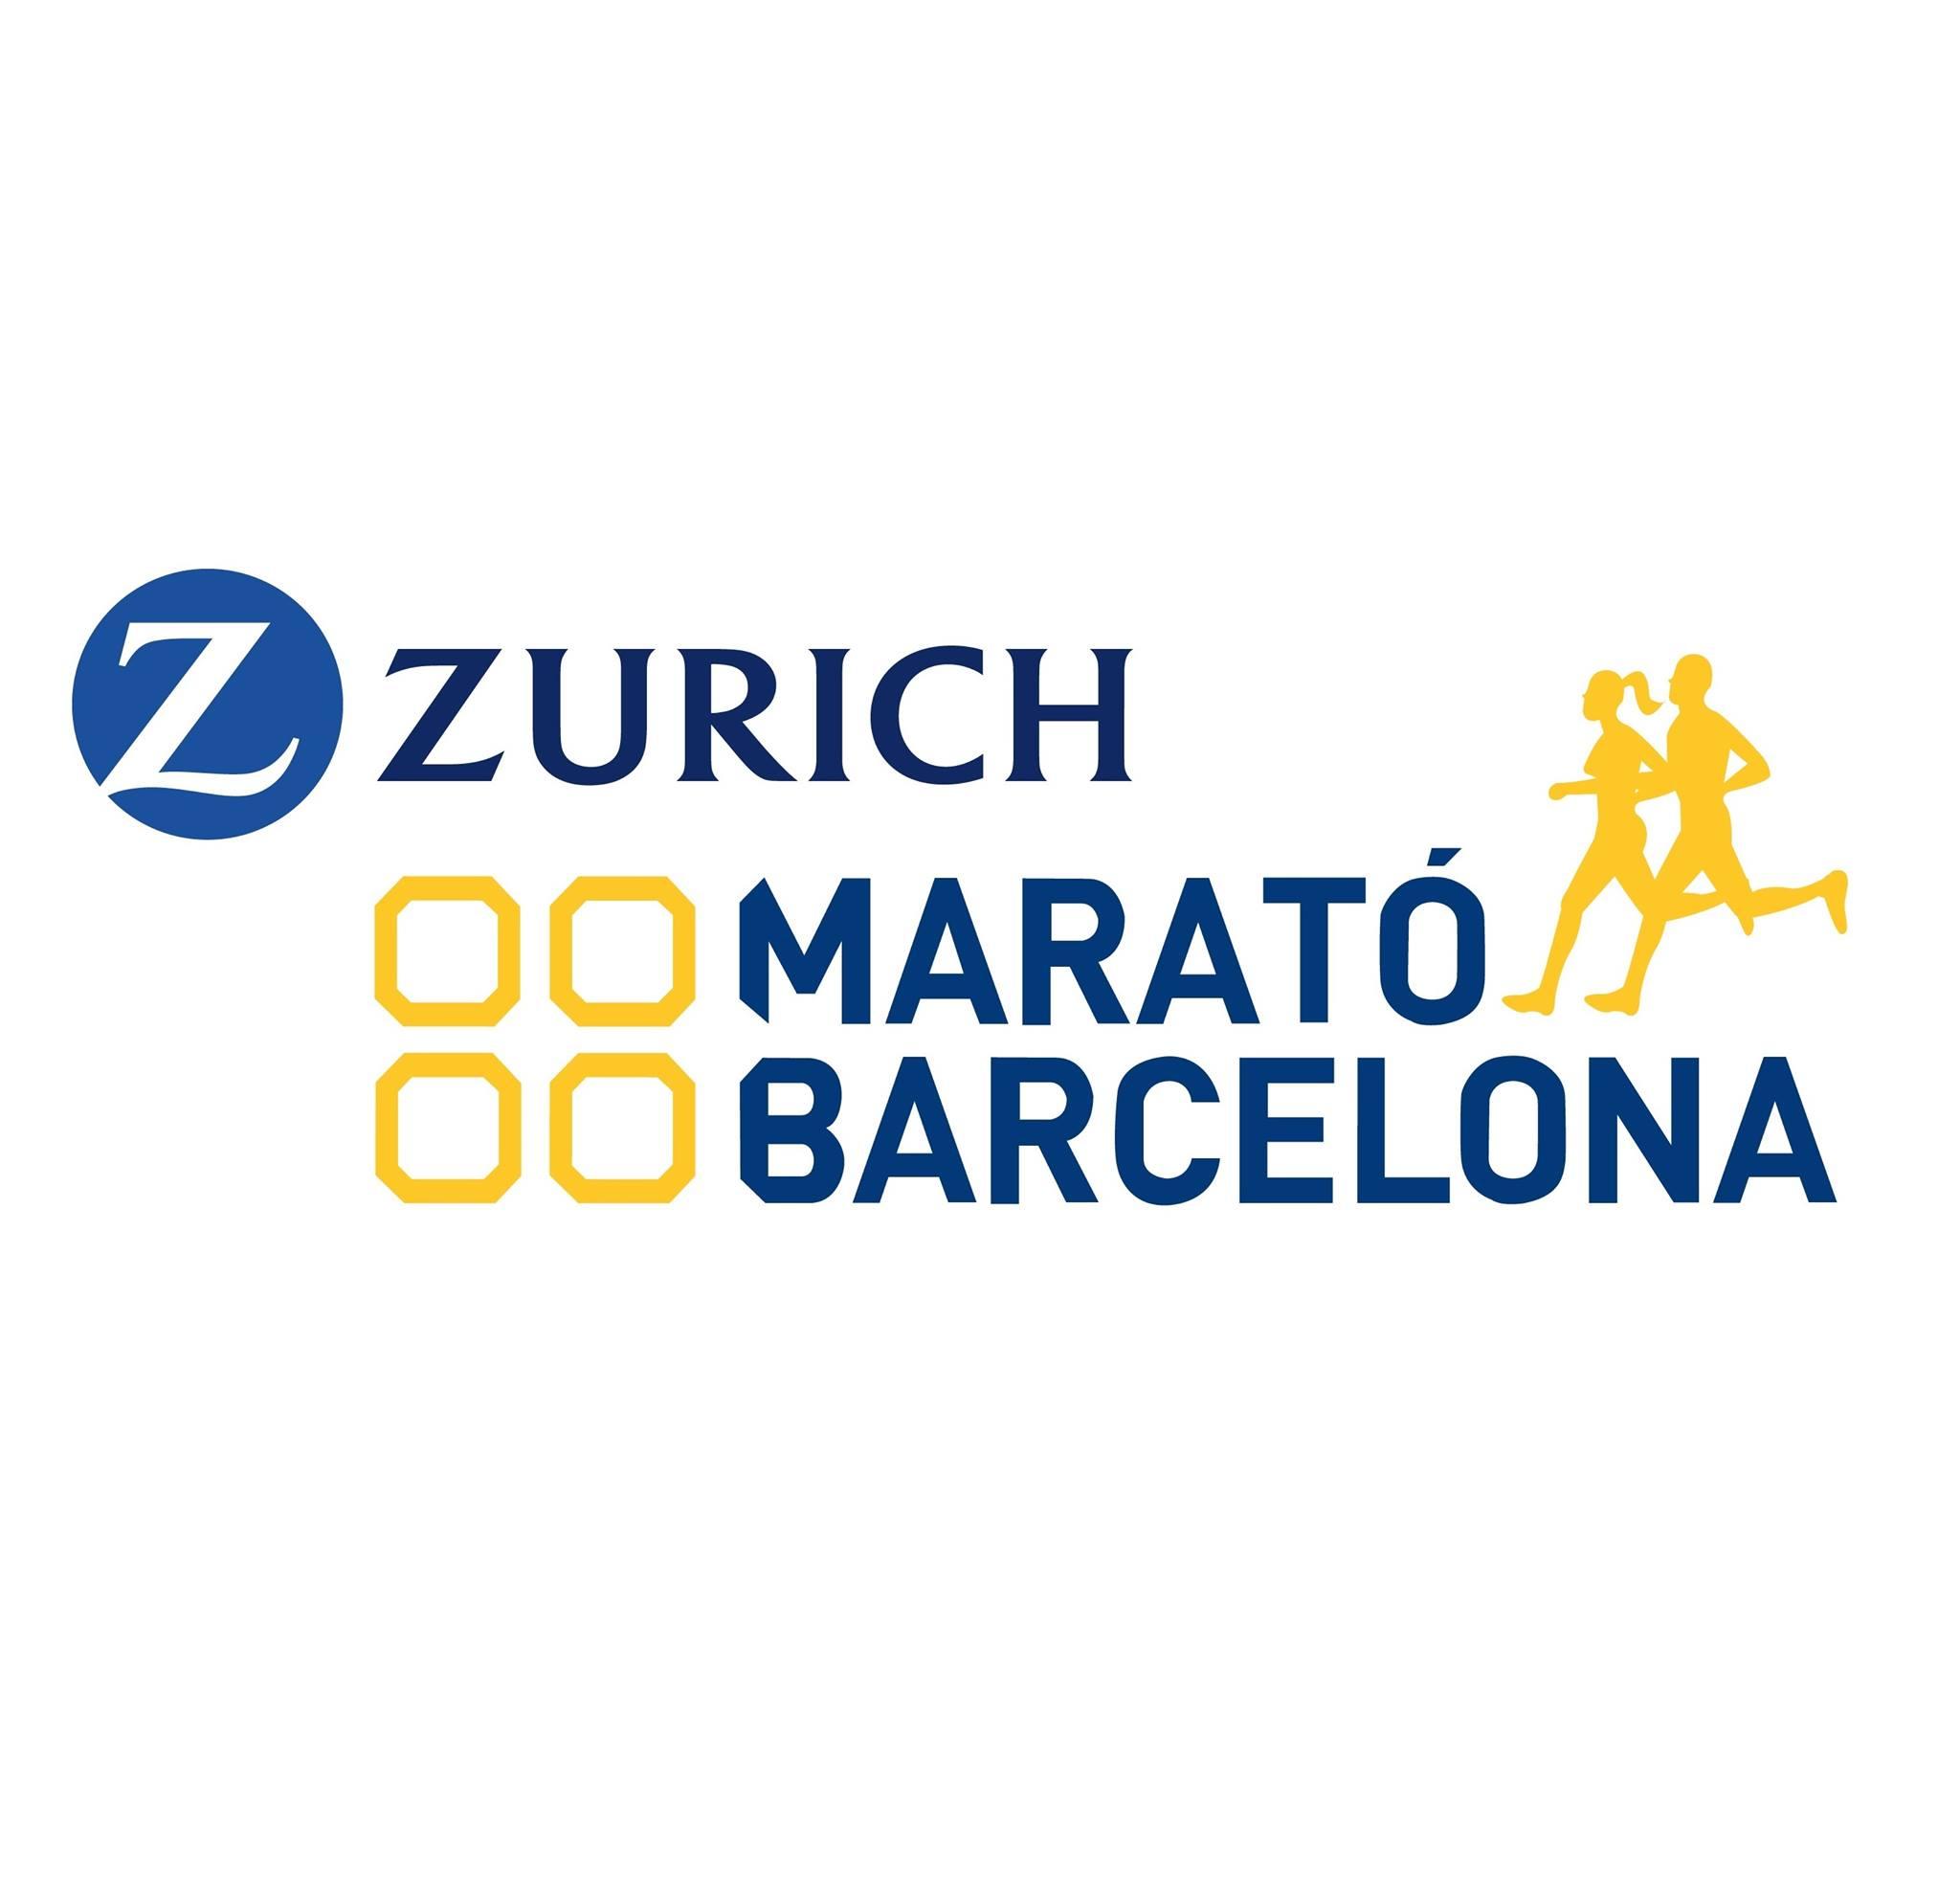 Barcelona Marathon - cover image